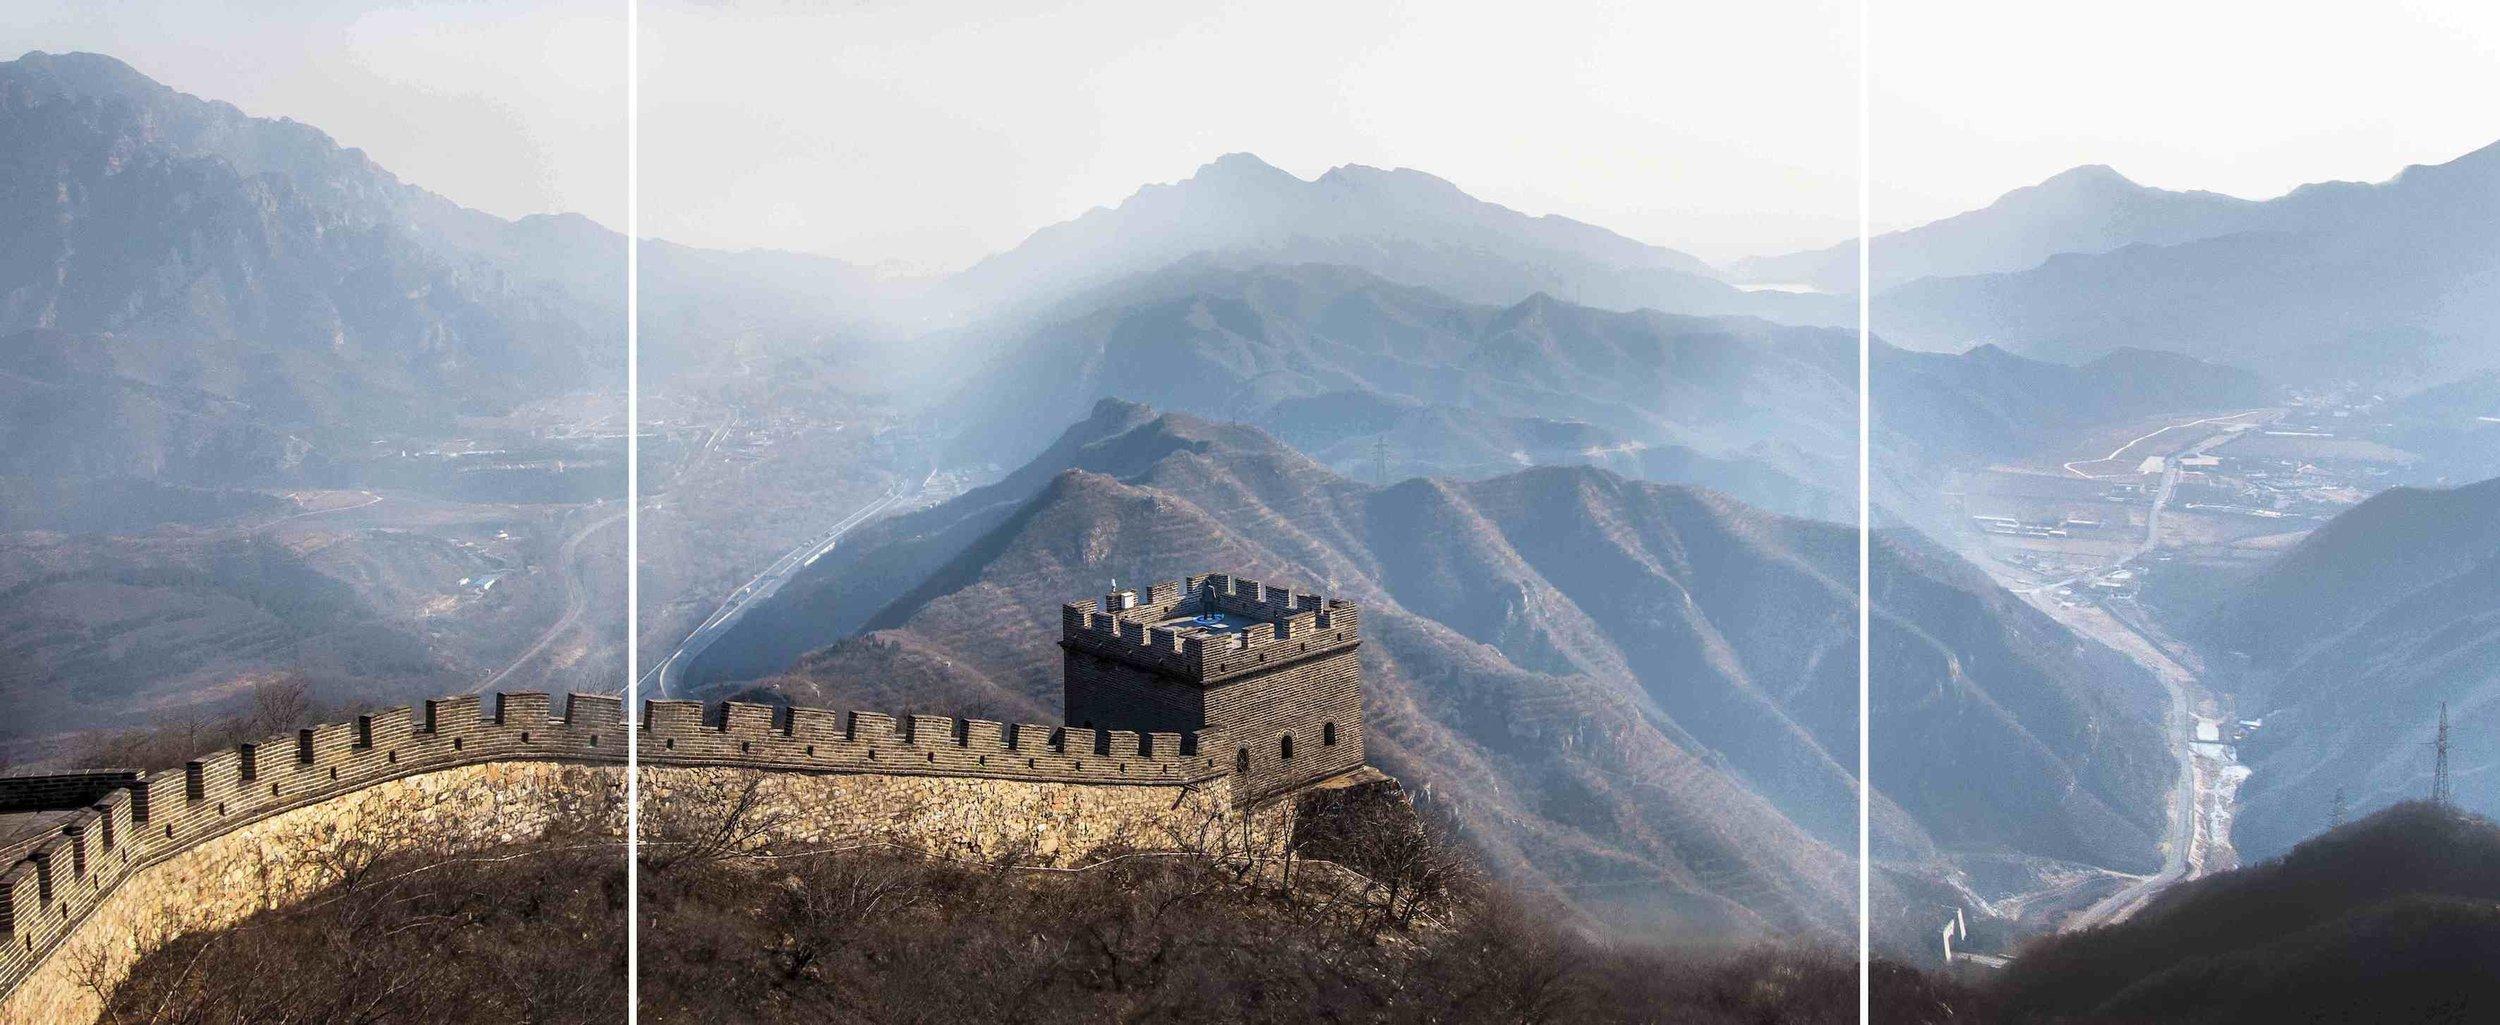 Soft Target: 4th Watchtower, Juyongguan Pass of Great Wall of China, Beijing, 2014, triptych, UV Inkjet Print, Photograph taken by Zhan Qian (Jane)